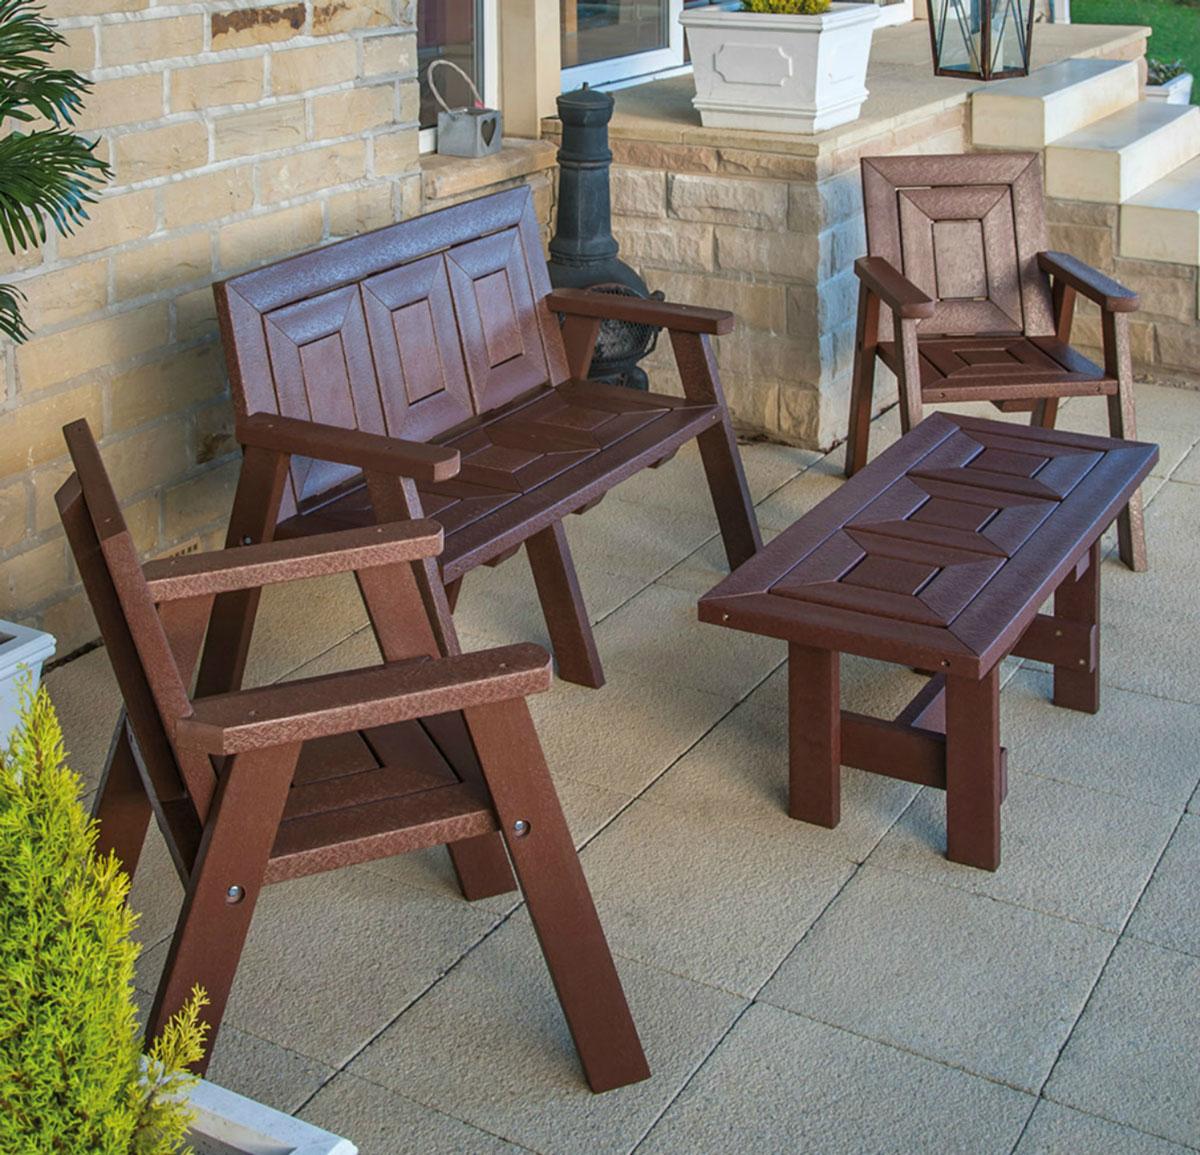 Harrogate Coffee Table with Seats